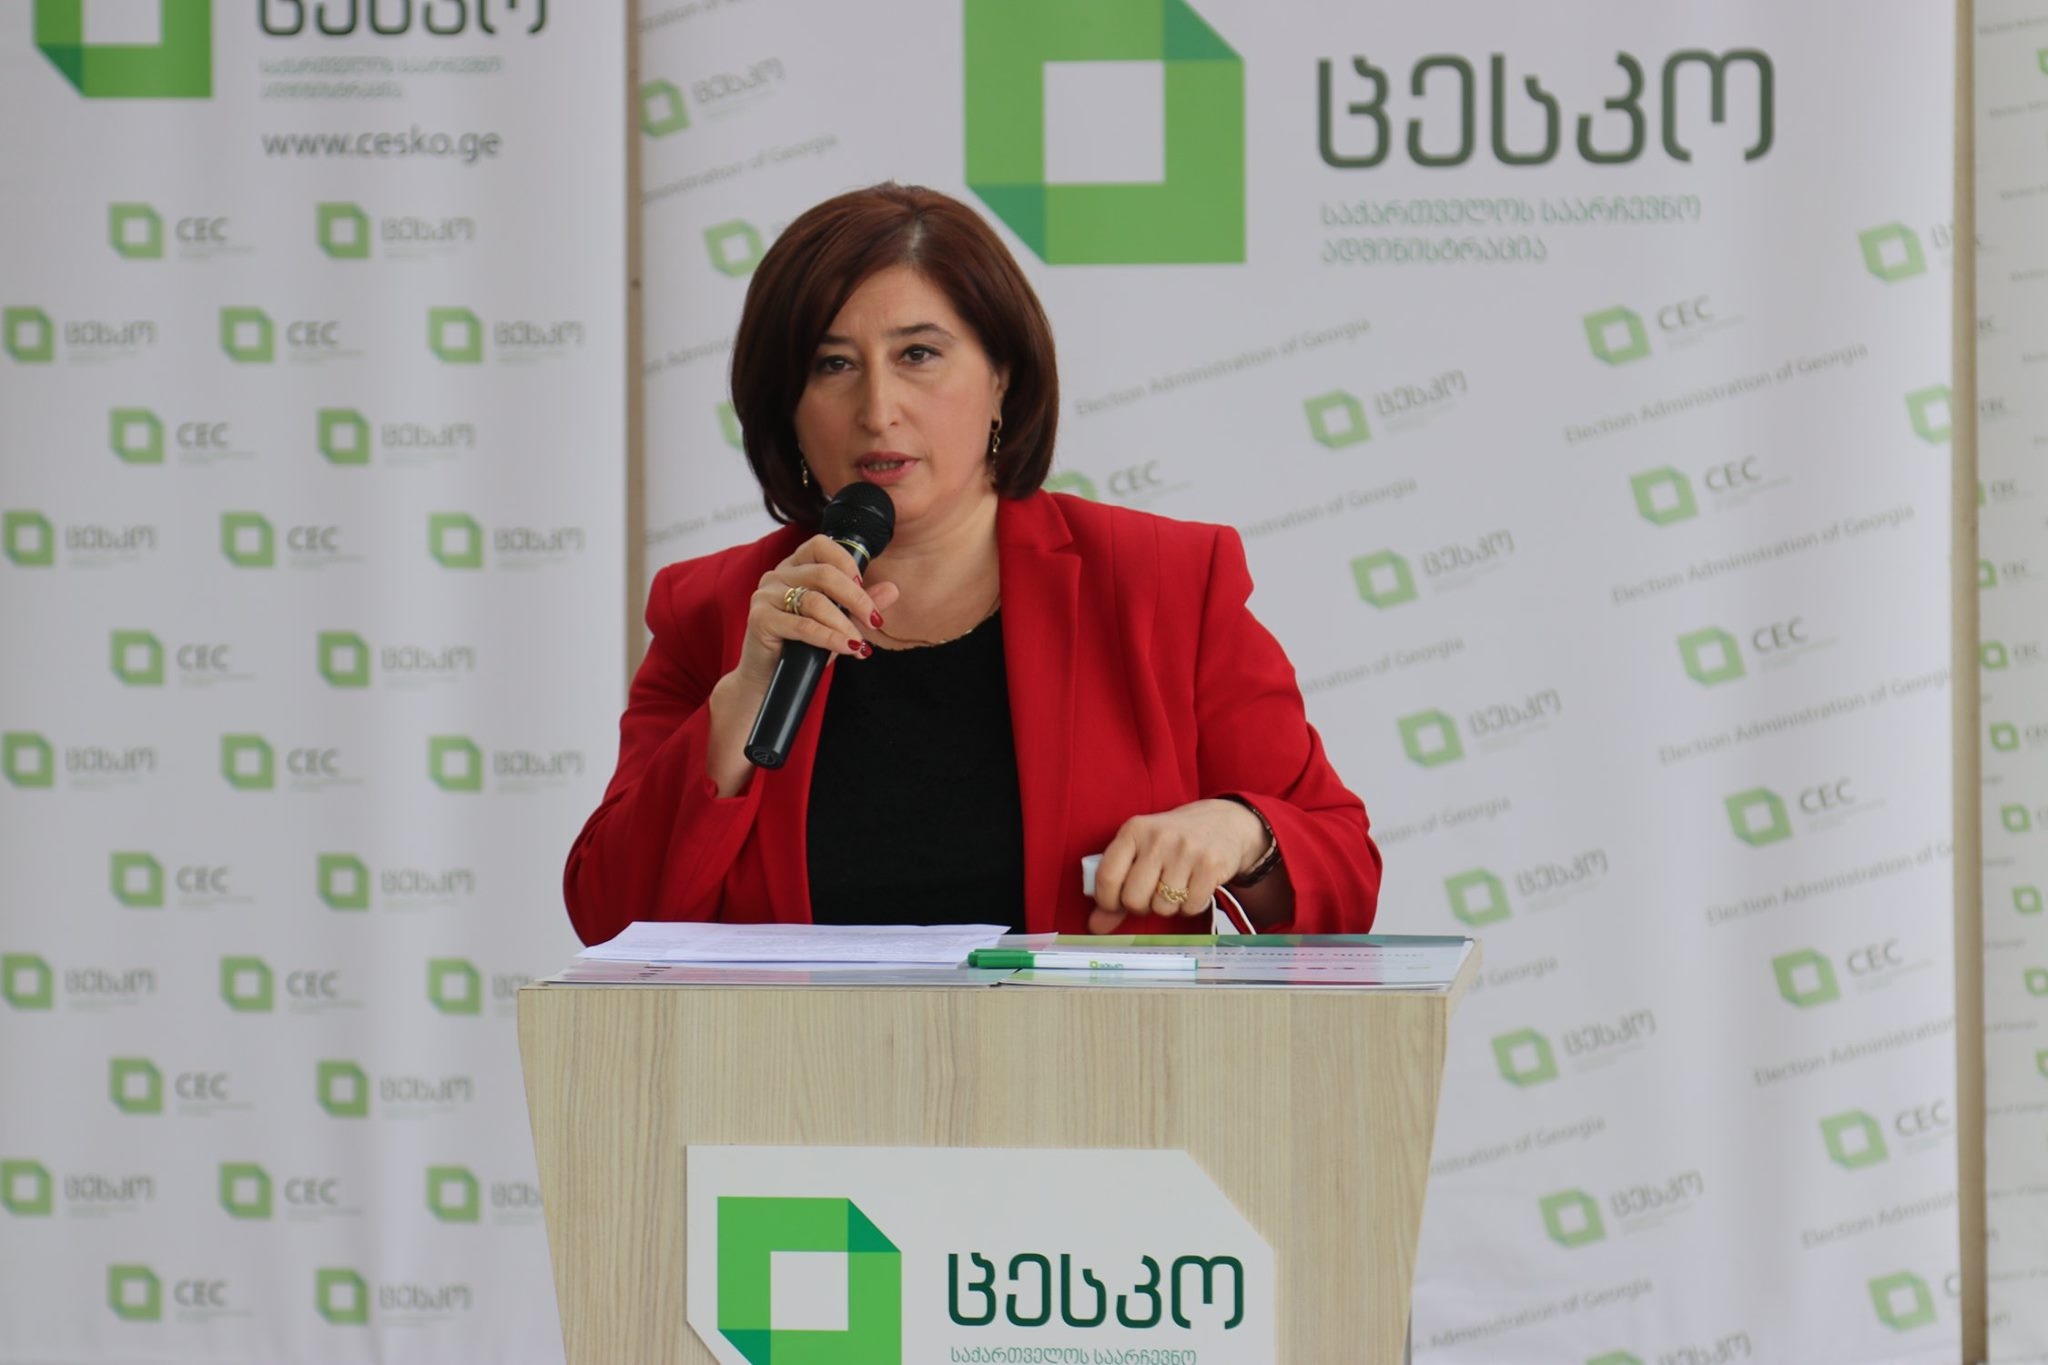 Tamar Zhvania #новости